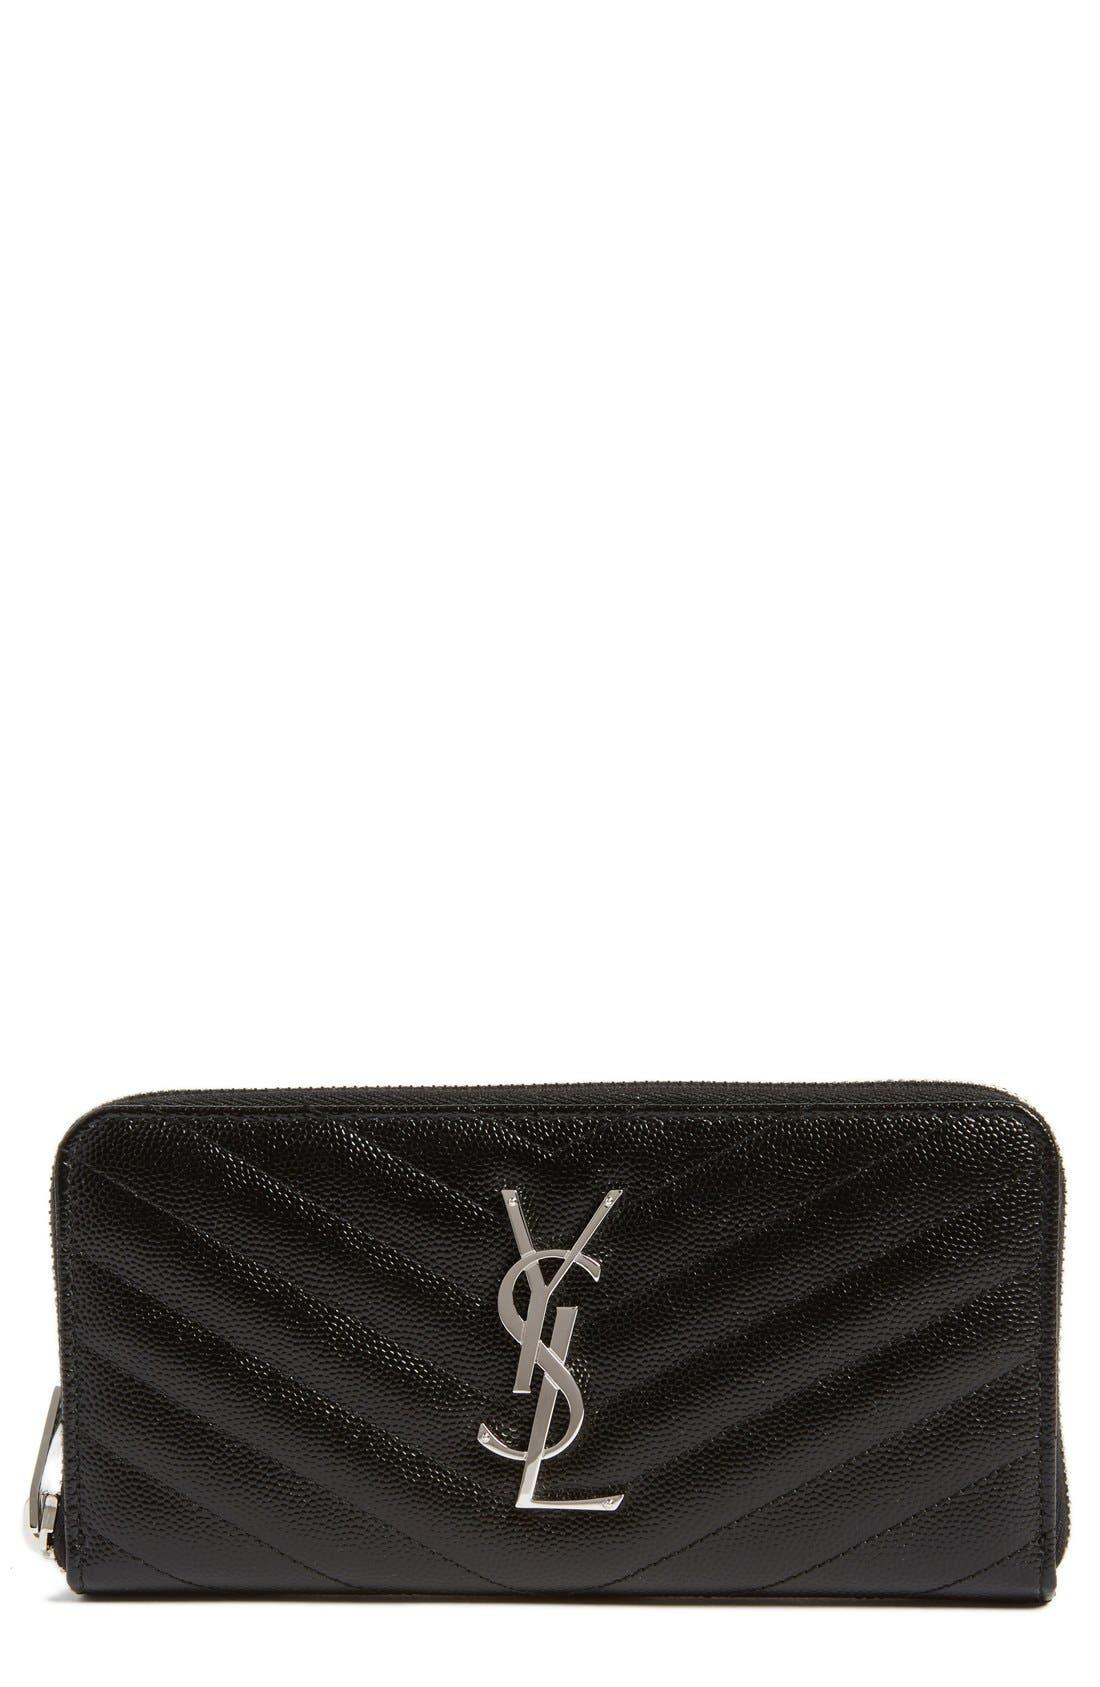 SAINT LAURENT Monogram Zip Around Quilted Calfskin Leather Wallet